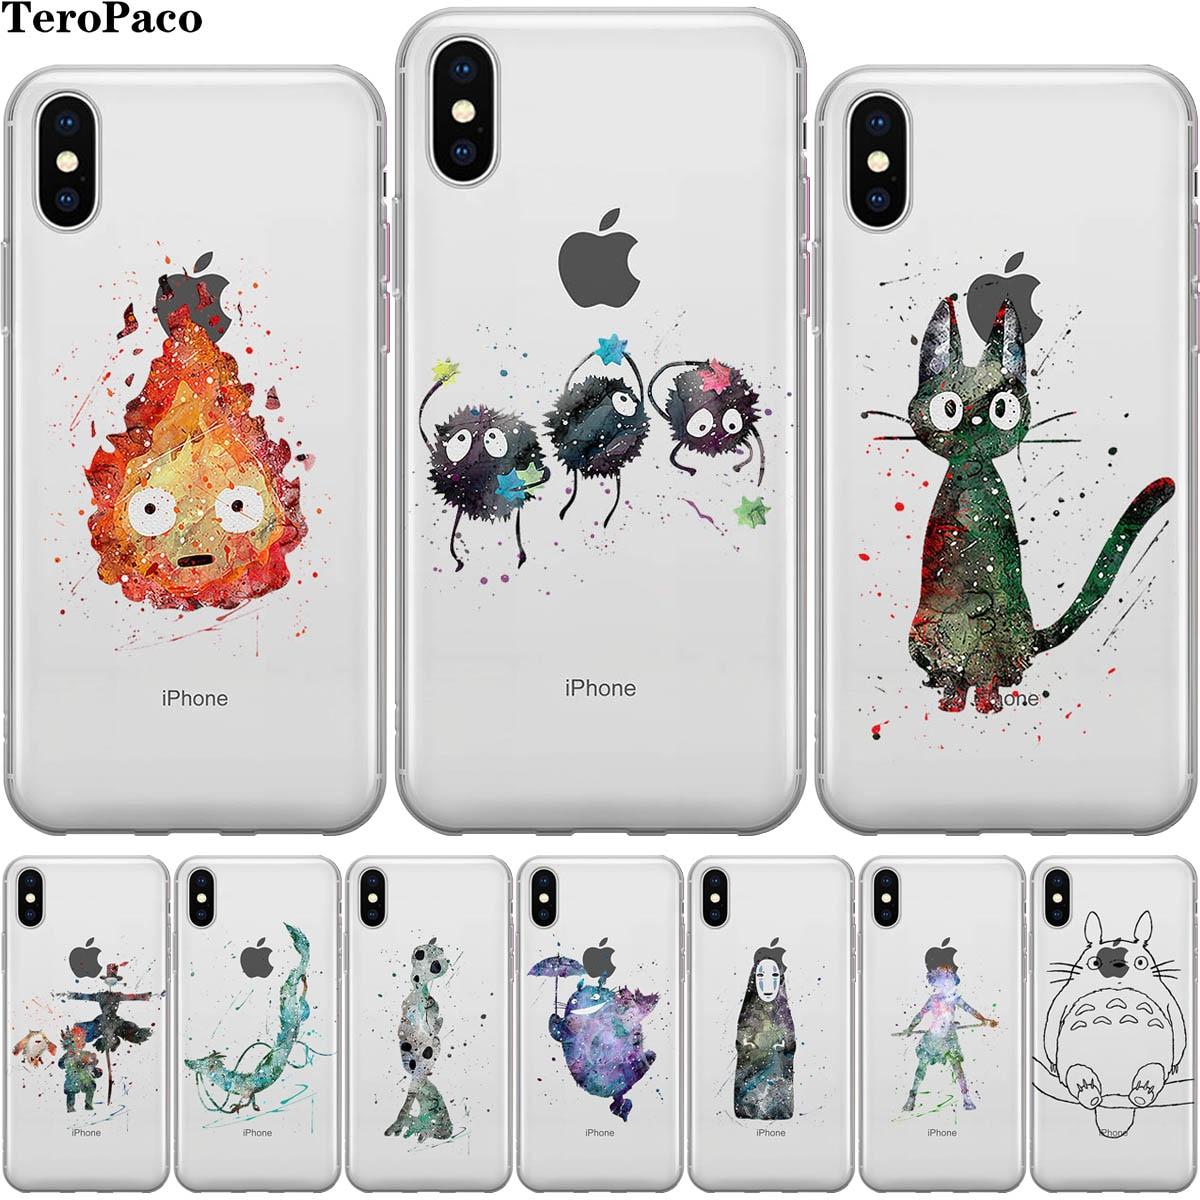 Para iPhone Funda X Caso A Viagem de Chihiro Miyazaki Totoro Para Iphone 5S SE 6 6S 7 8 Plus X XS 11 Pro Max XR Silicone Suave Caso Capa